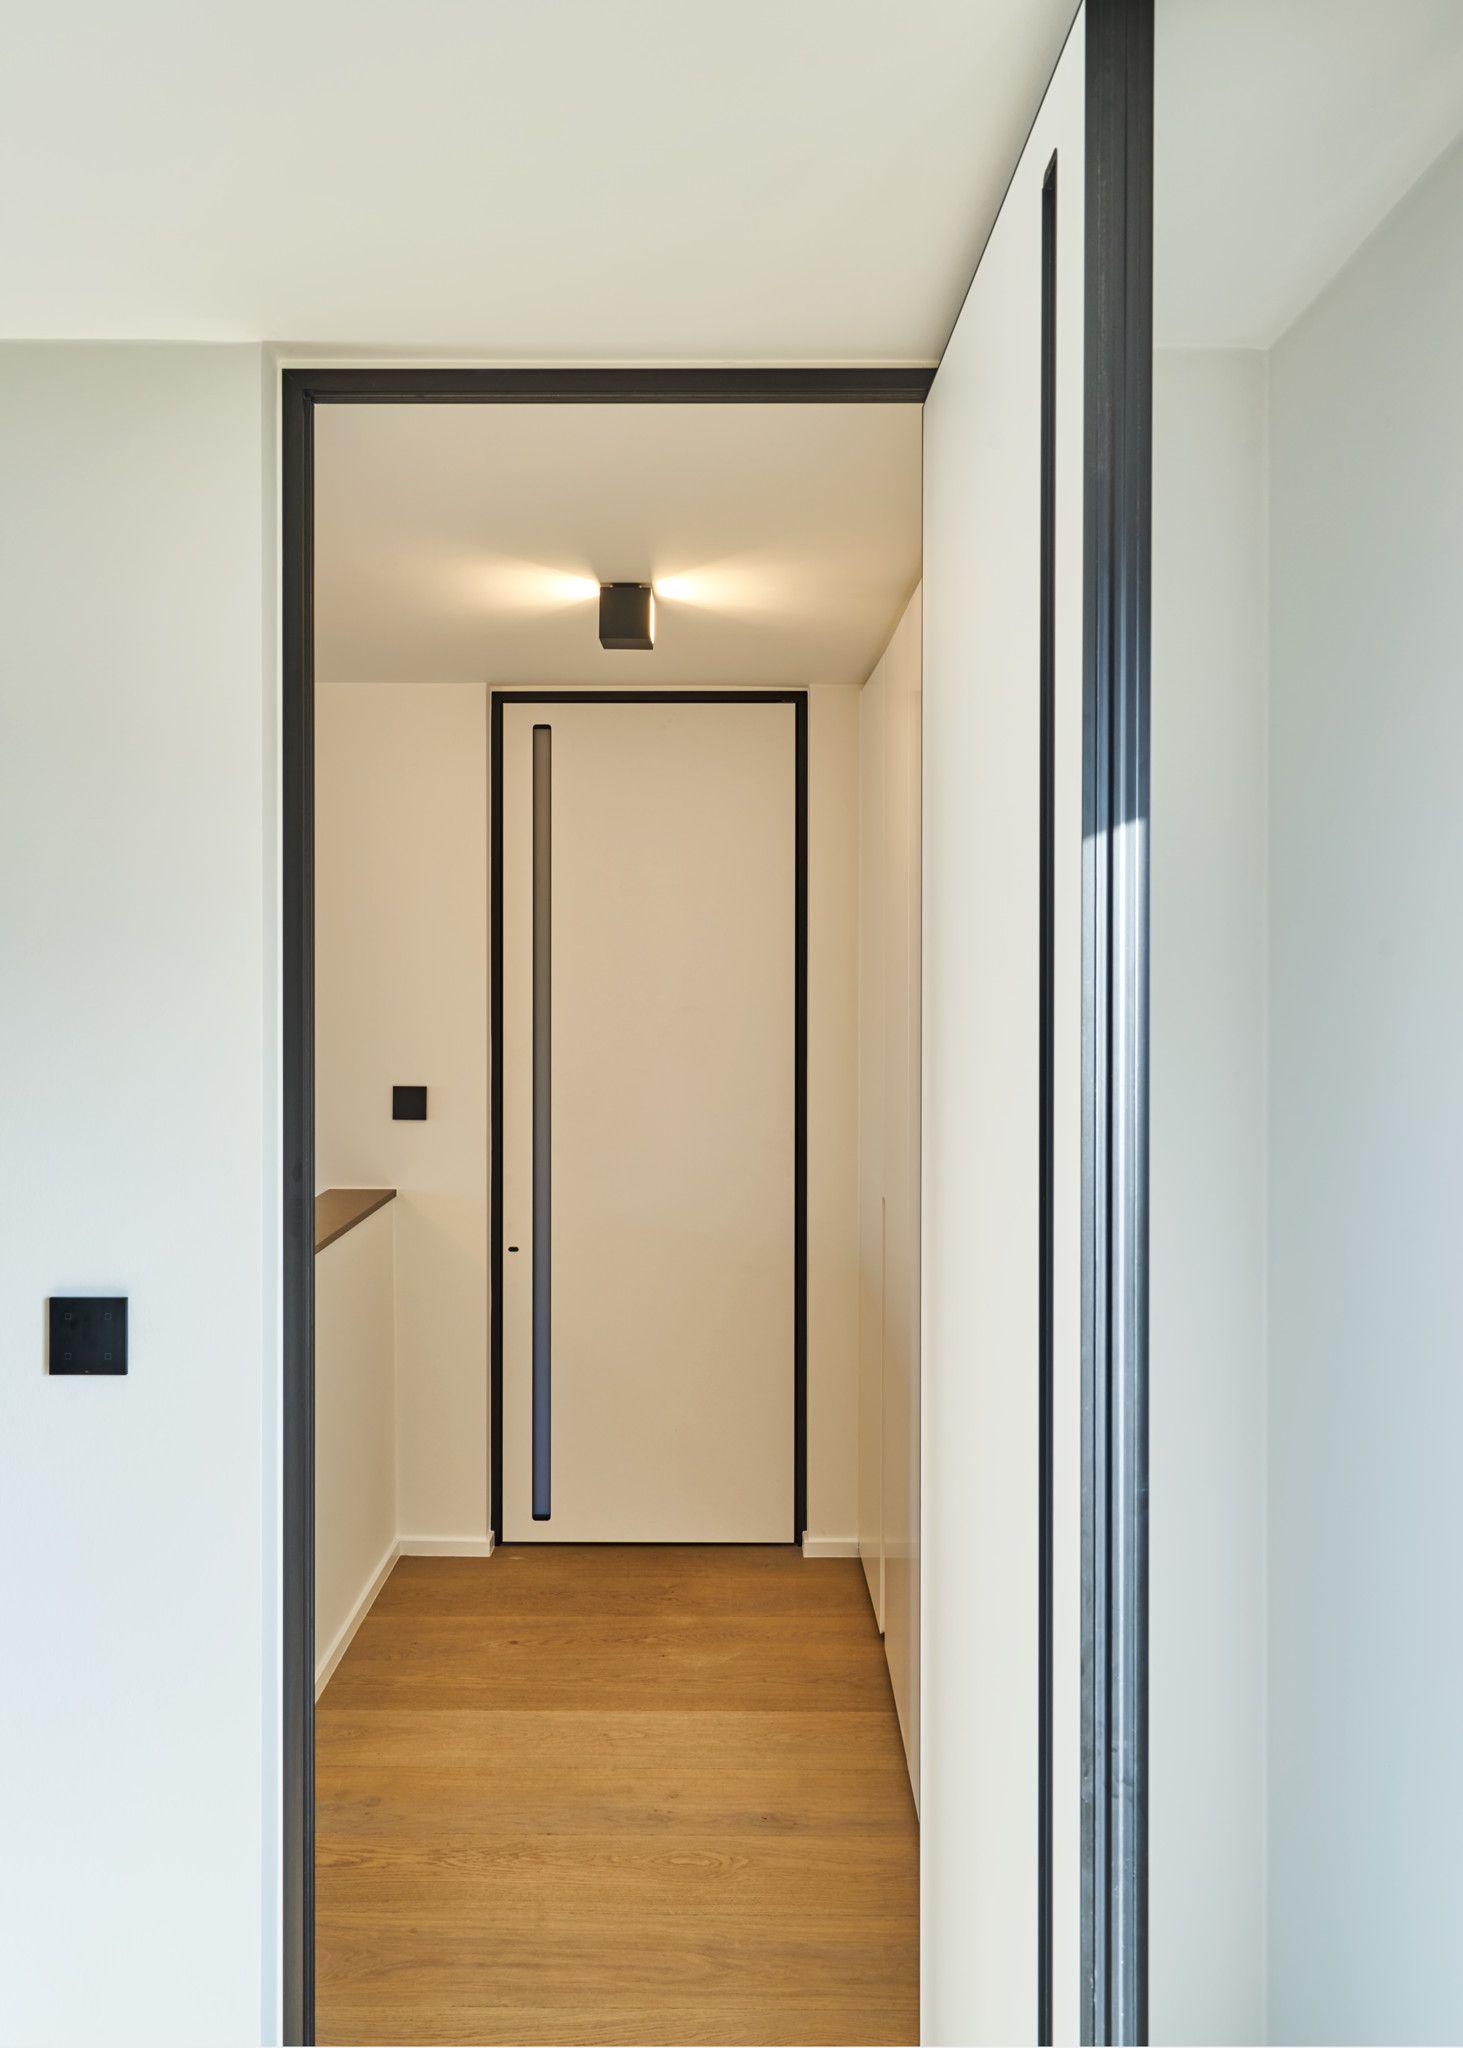 custom made internal doors on custom made modern doors doors interior doors interior modern modern interior pinterest